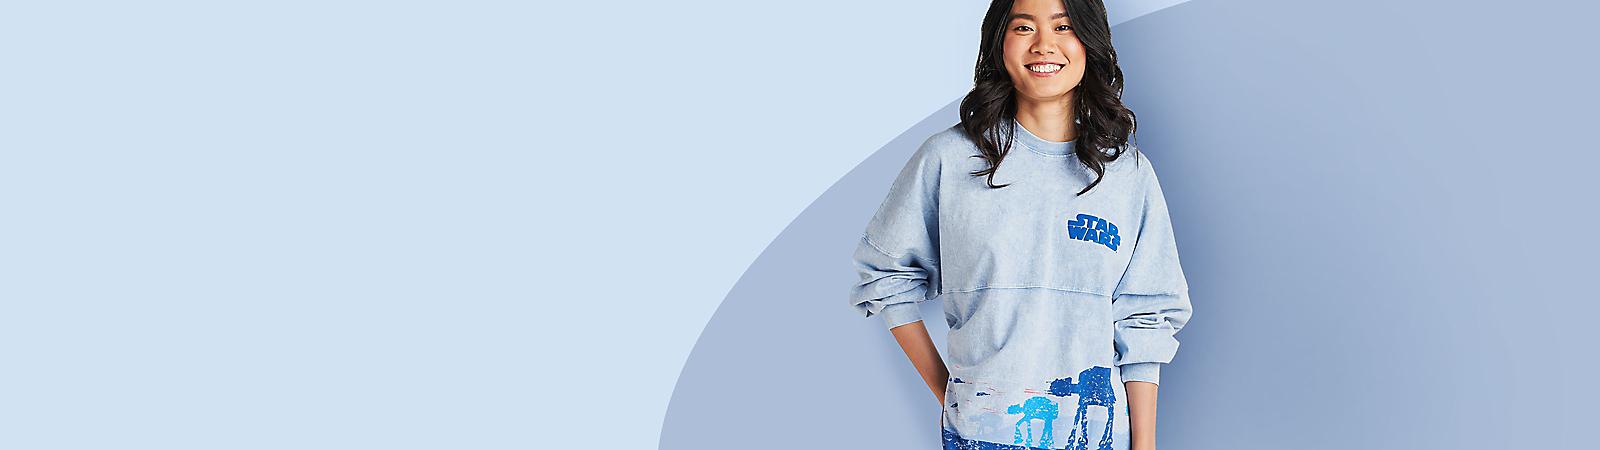 NEW BHS Boys Blue sweatshirt with hoddy top long sleeved Years 2 3 /& 4